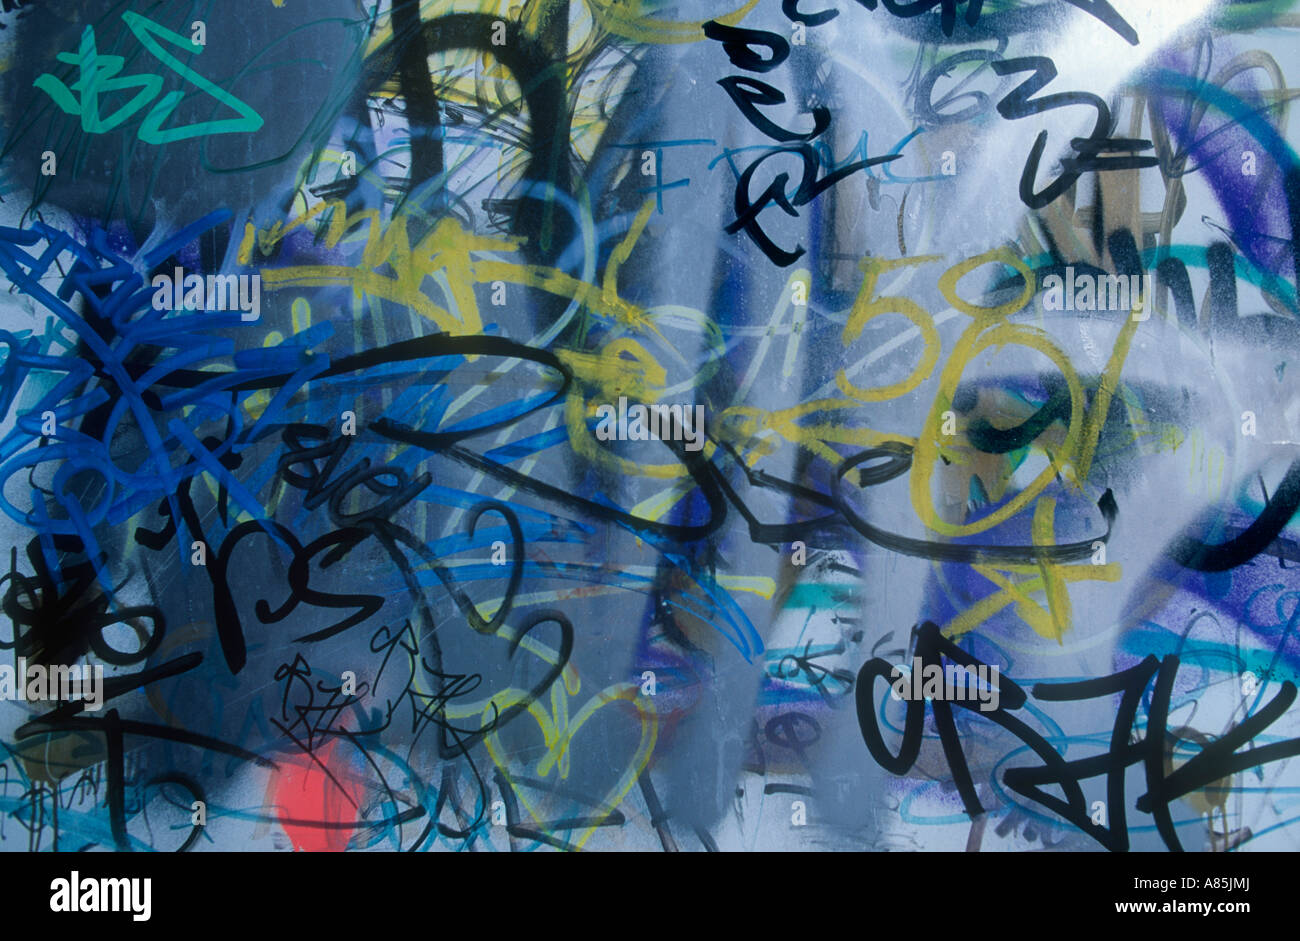 GRAFFITTI PAINT IN URBAN WALL - Stock Image